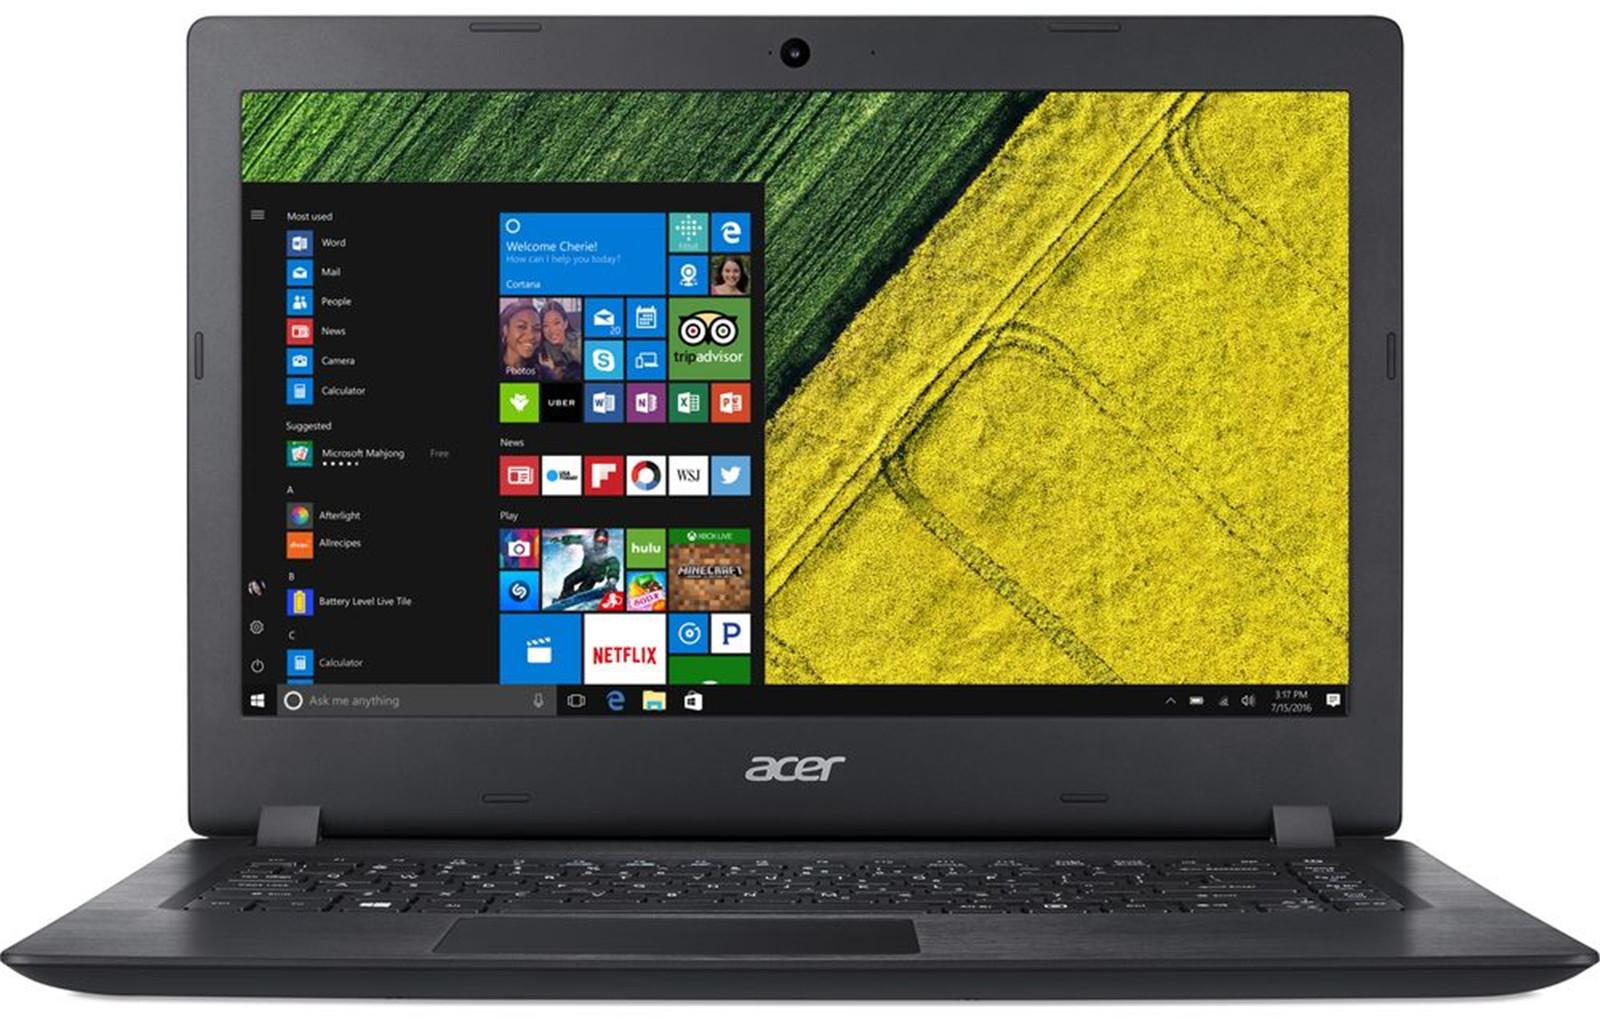 "14.0"" Acer Aspire Laptop image"